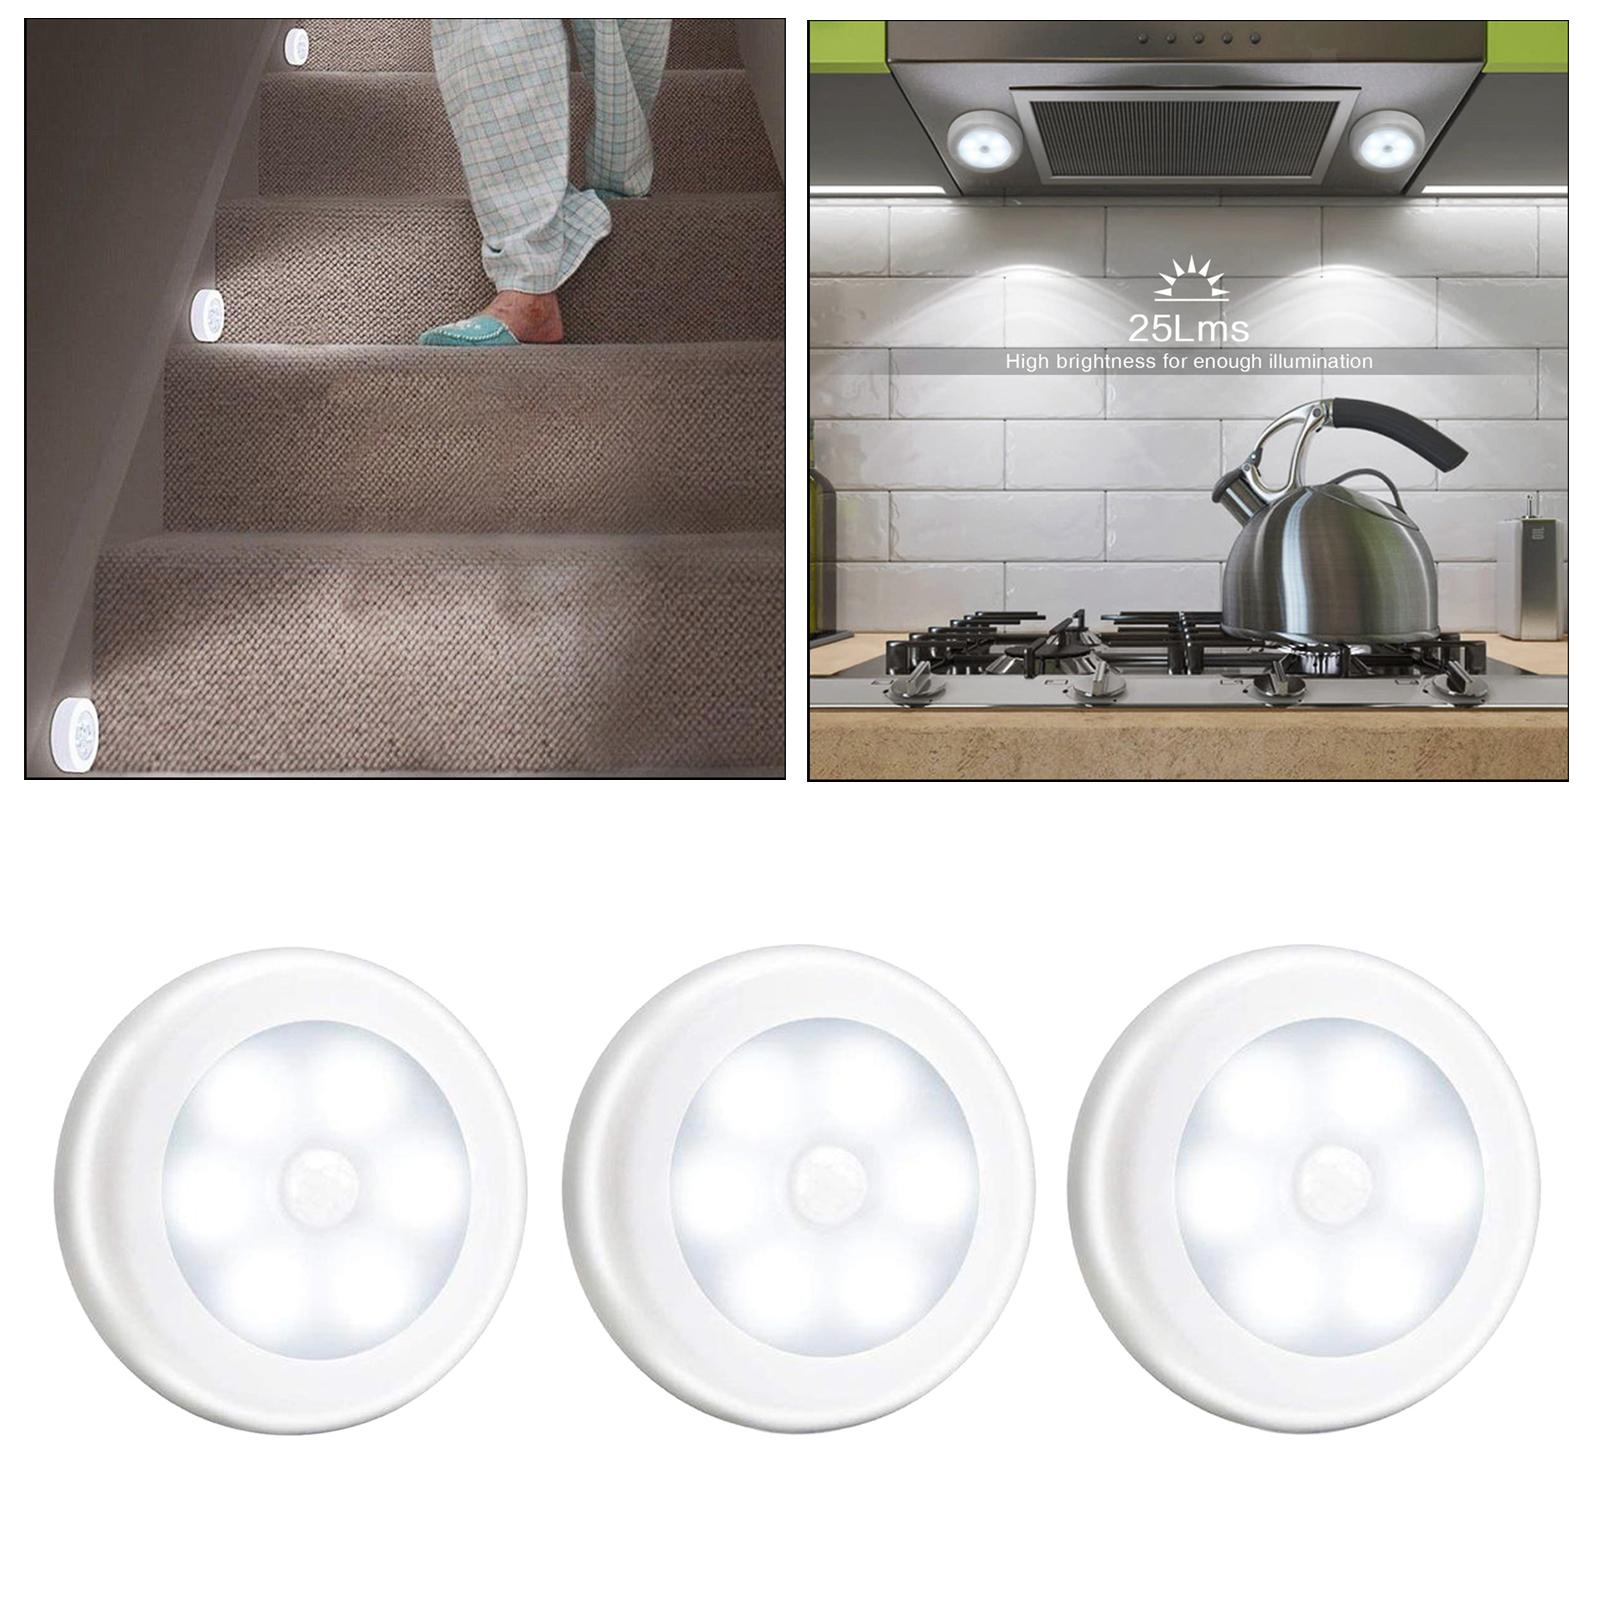 3pcs 1w Pir Motion Sensor 6 Led Night Light Lamp For Bathroom Wall Wardrobe Ebay